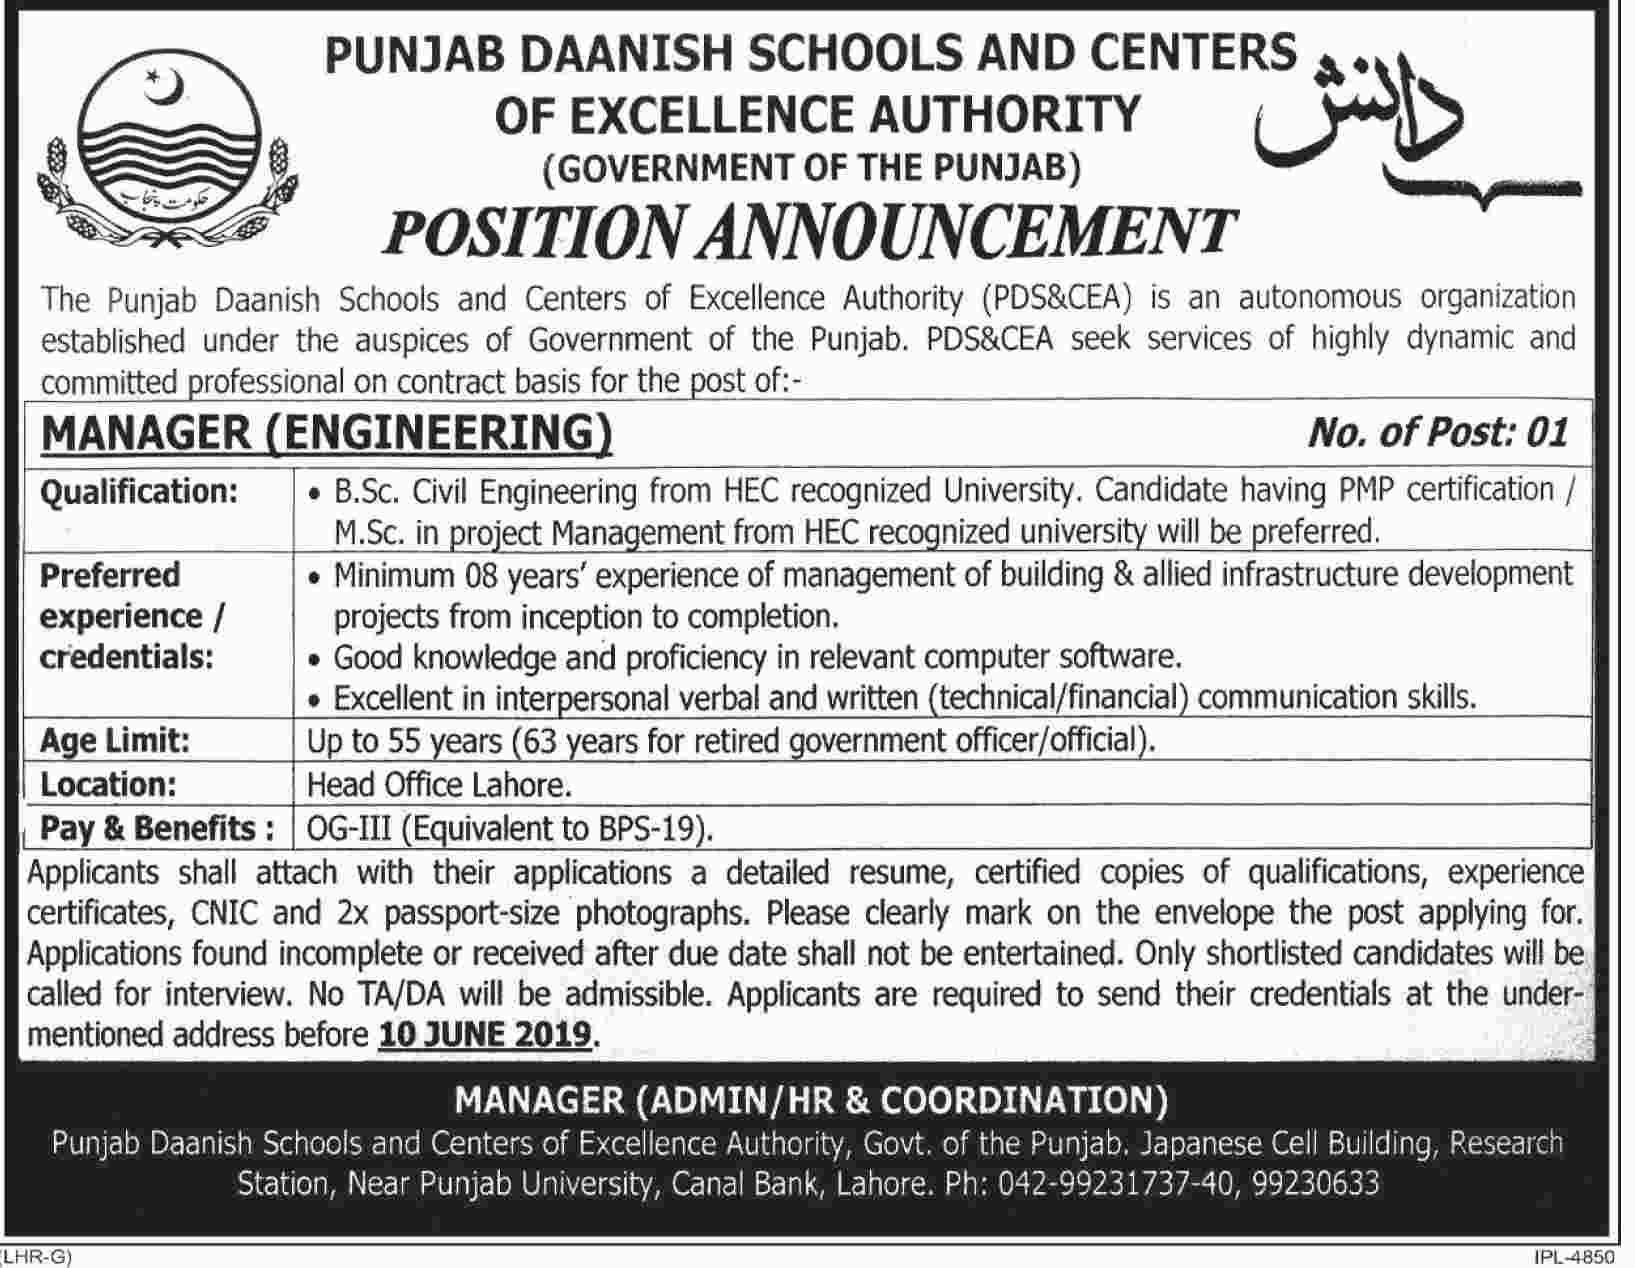 Daanish Schools Govt Of Punjab Jobs 01 Jun 2019 - Prepistan Jobs